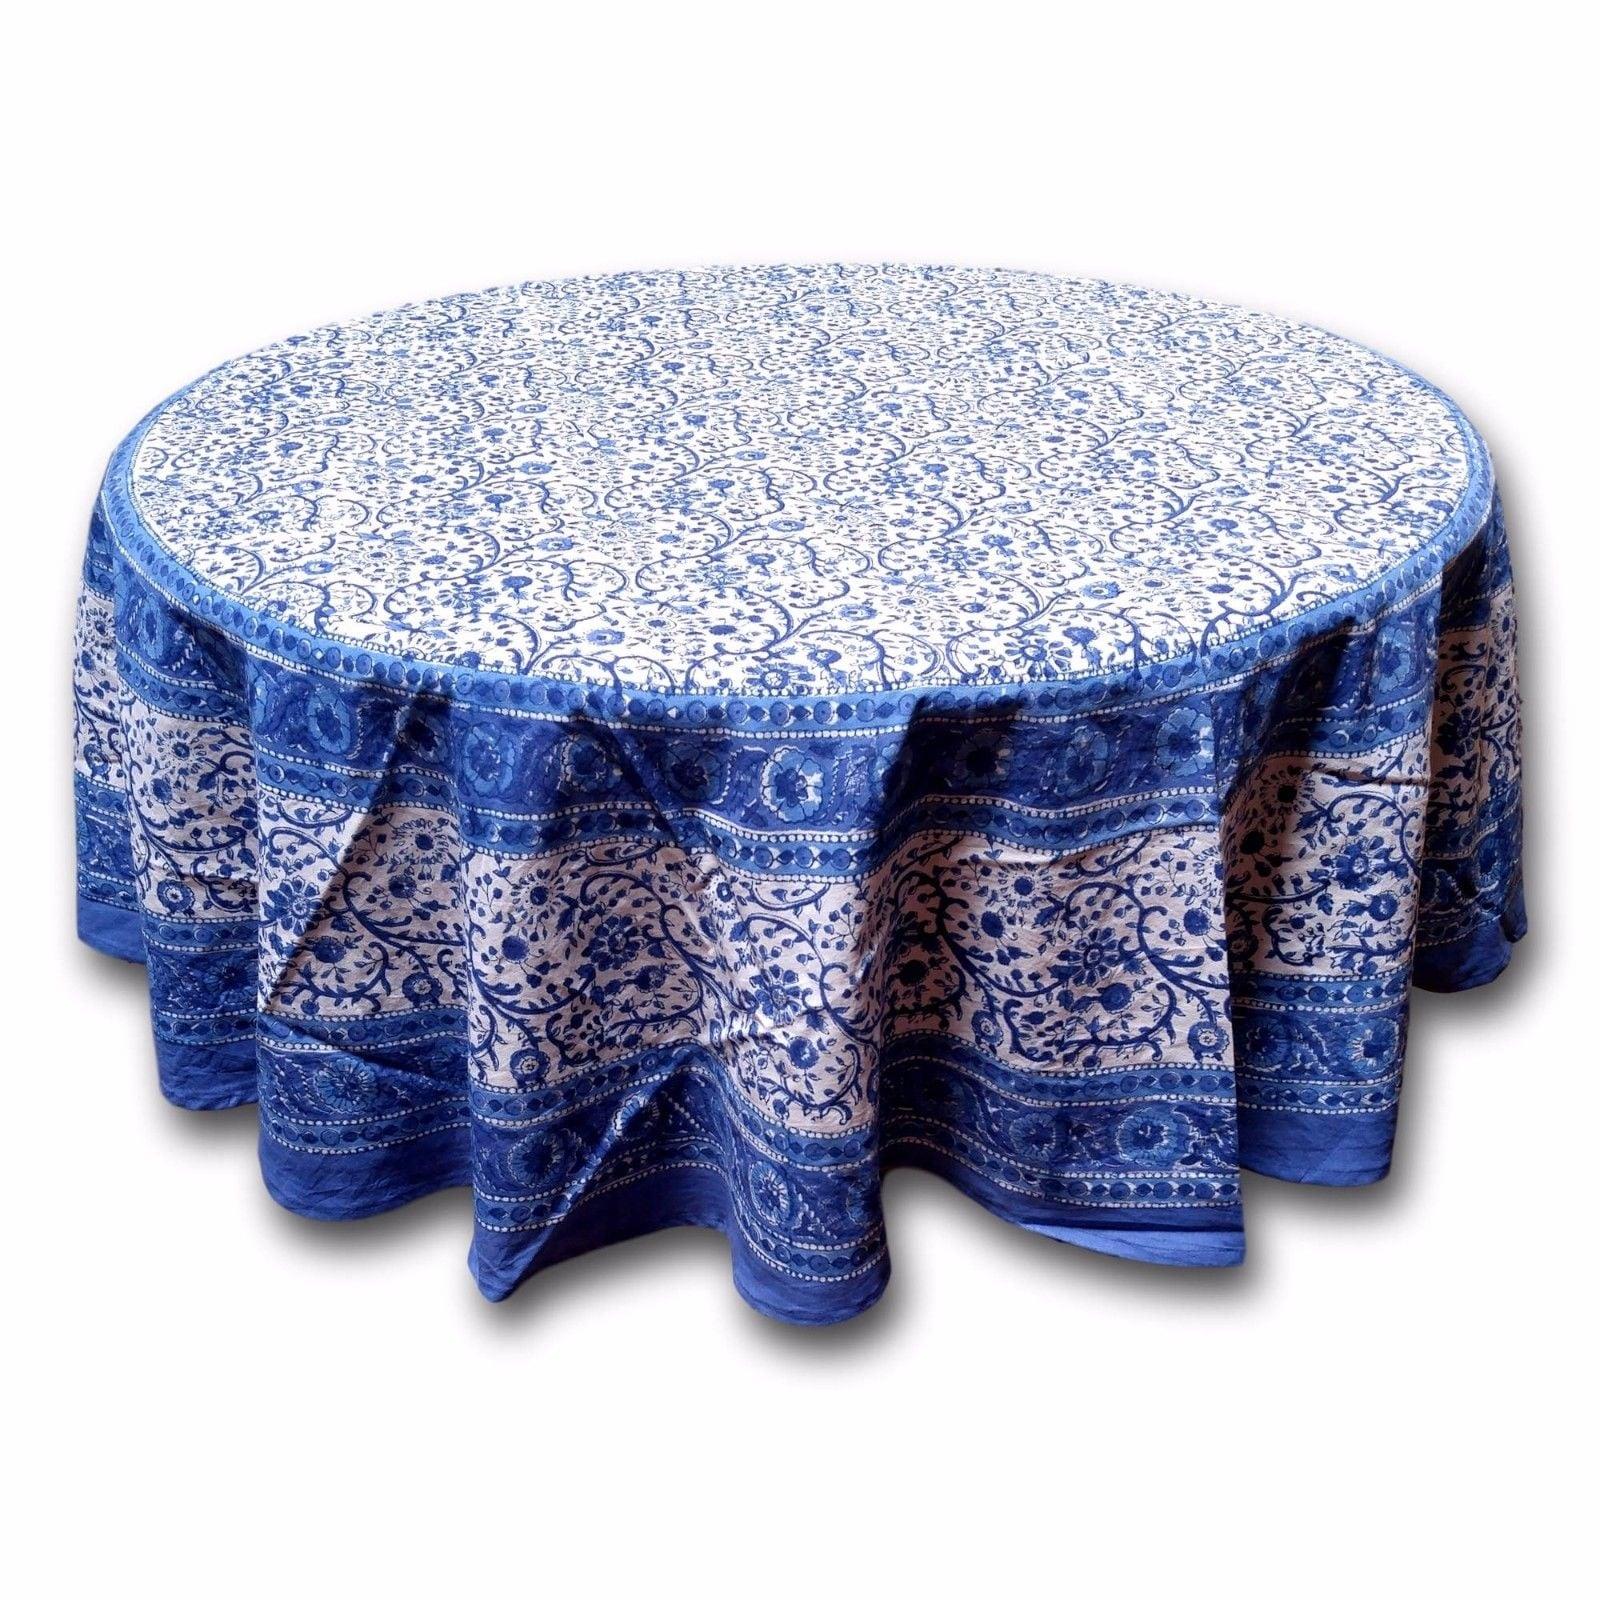 Rajasthan Block Print Floral Round Tablecloth Rectangular Cotton Table Napkins Placemats Runner - Thumbnail 8